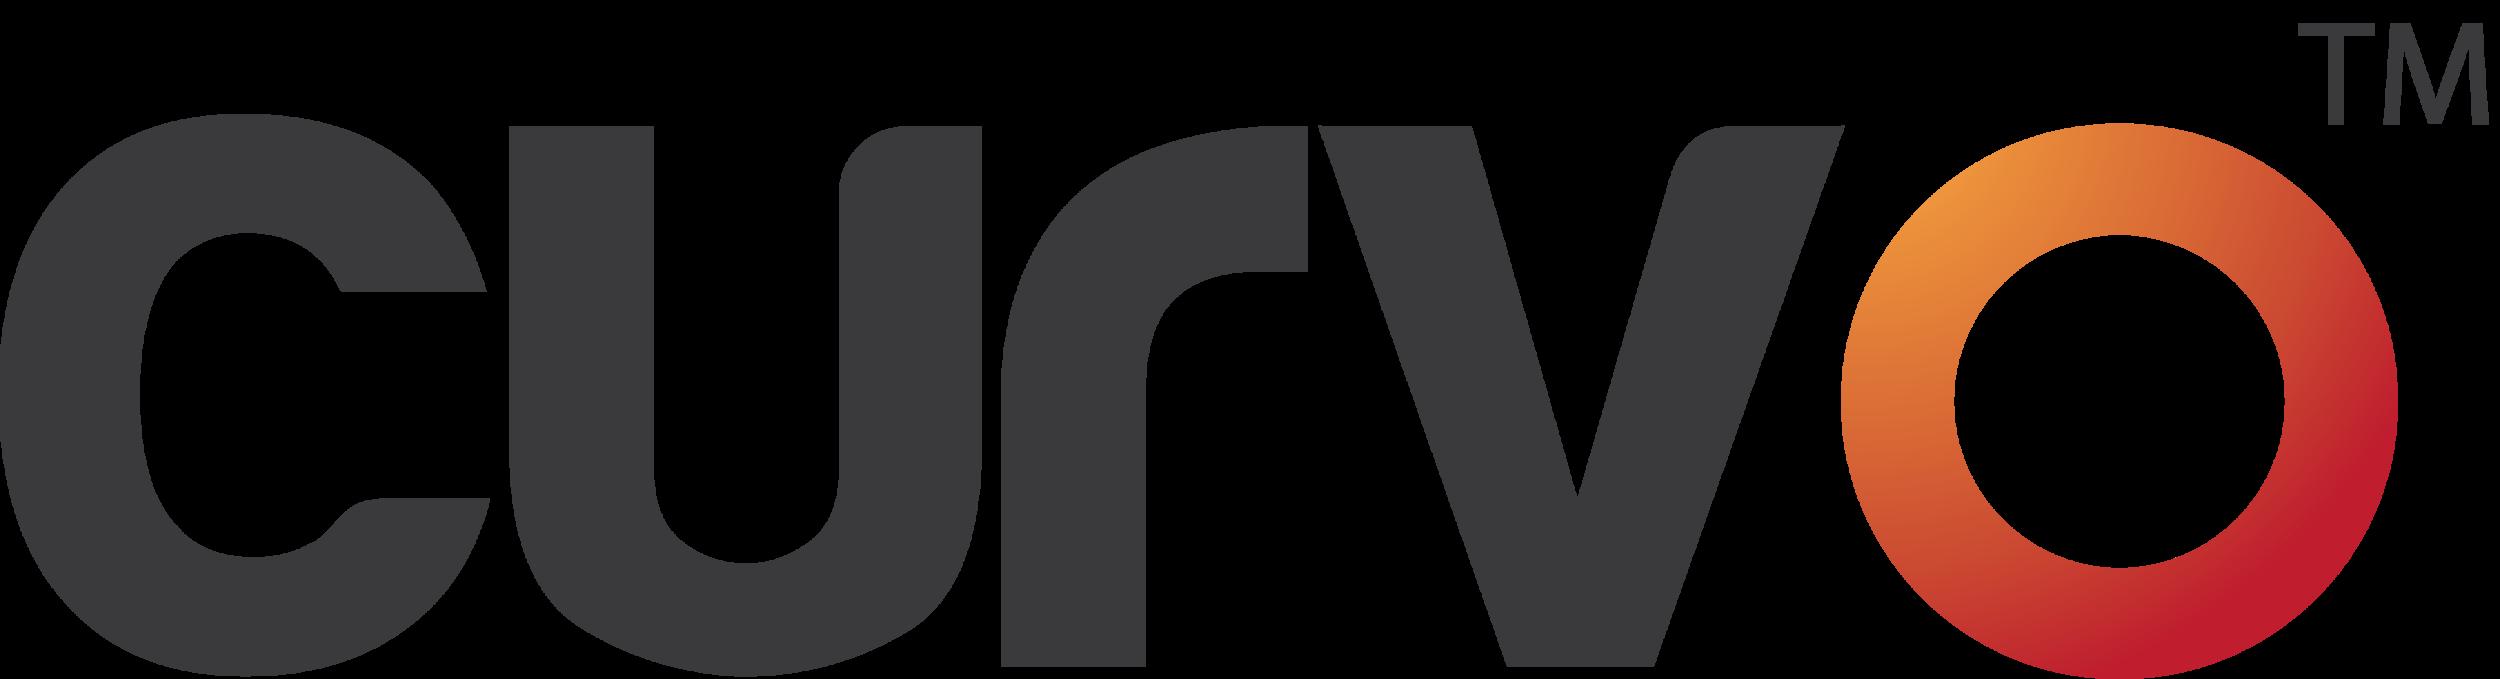 Curvo_Logo-3.png